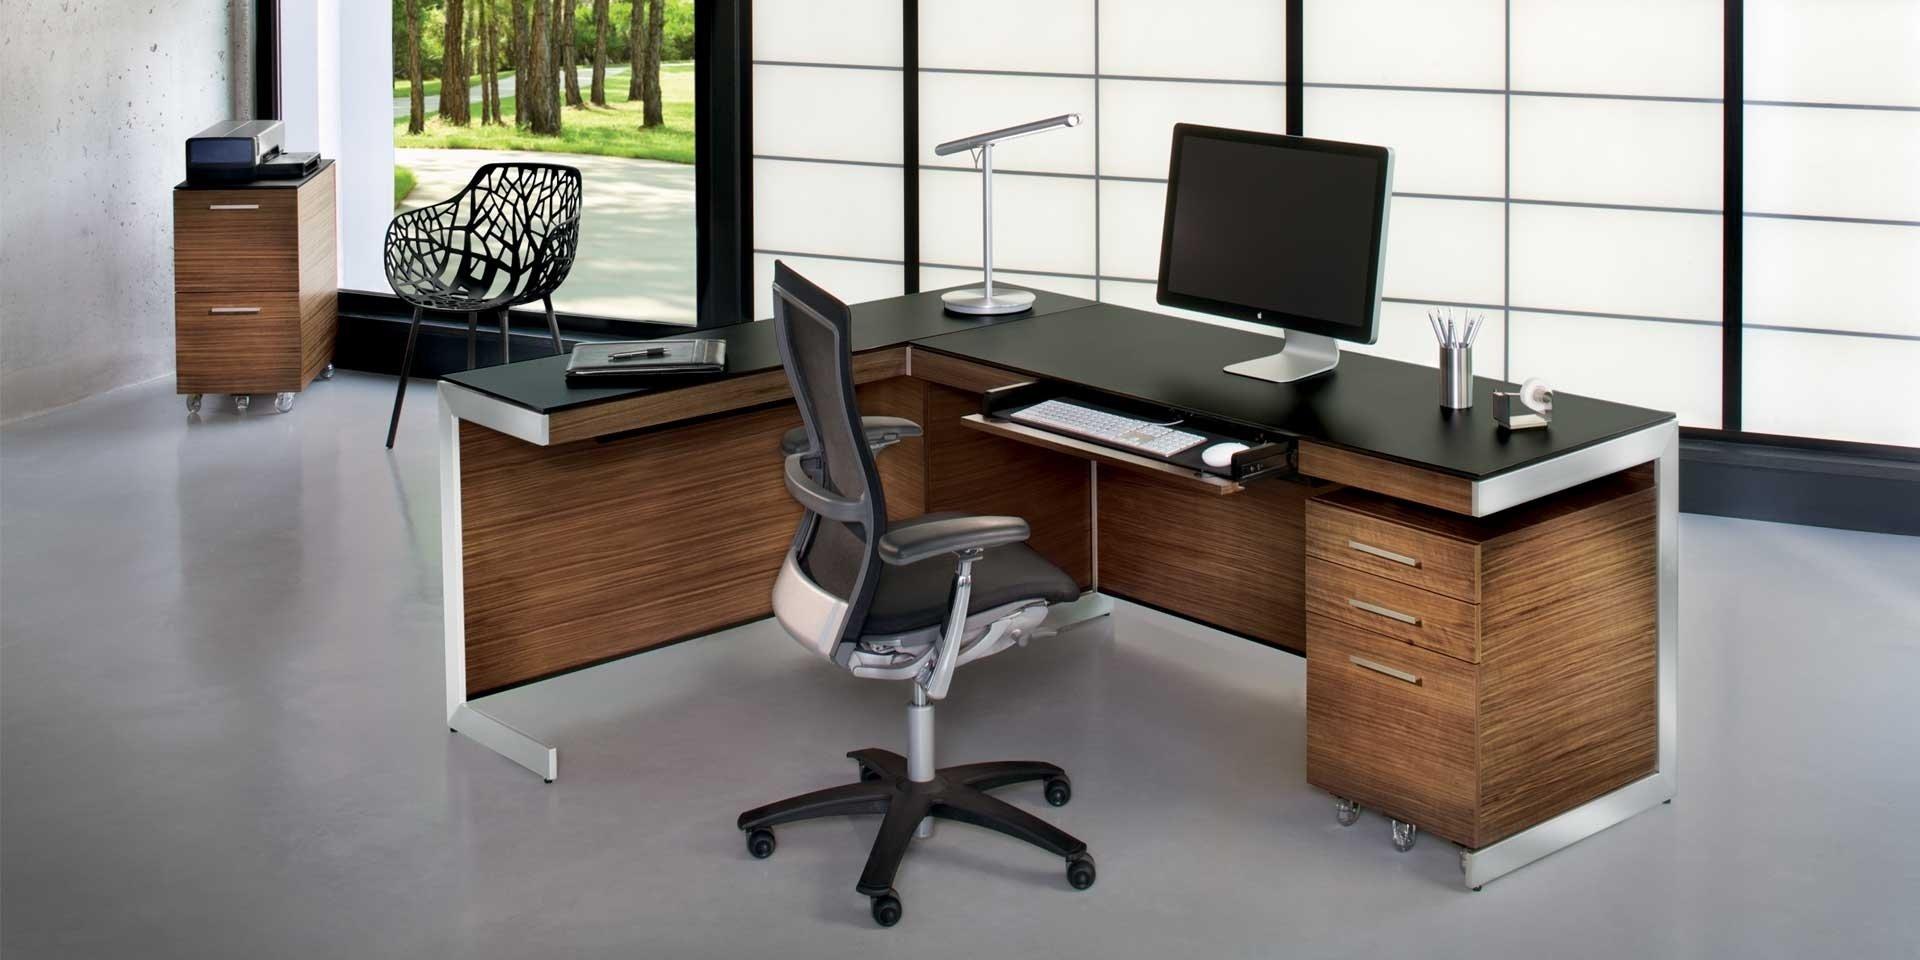 10 Unique Bright Ideas Royal Oak Mi fancy bright ideas furniture royal oak mi 42 love to work from home 2021